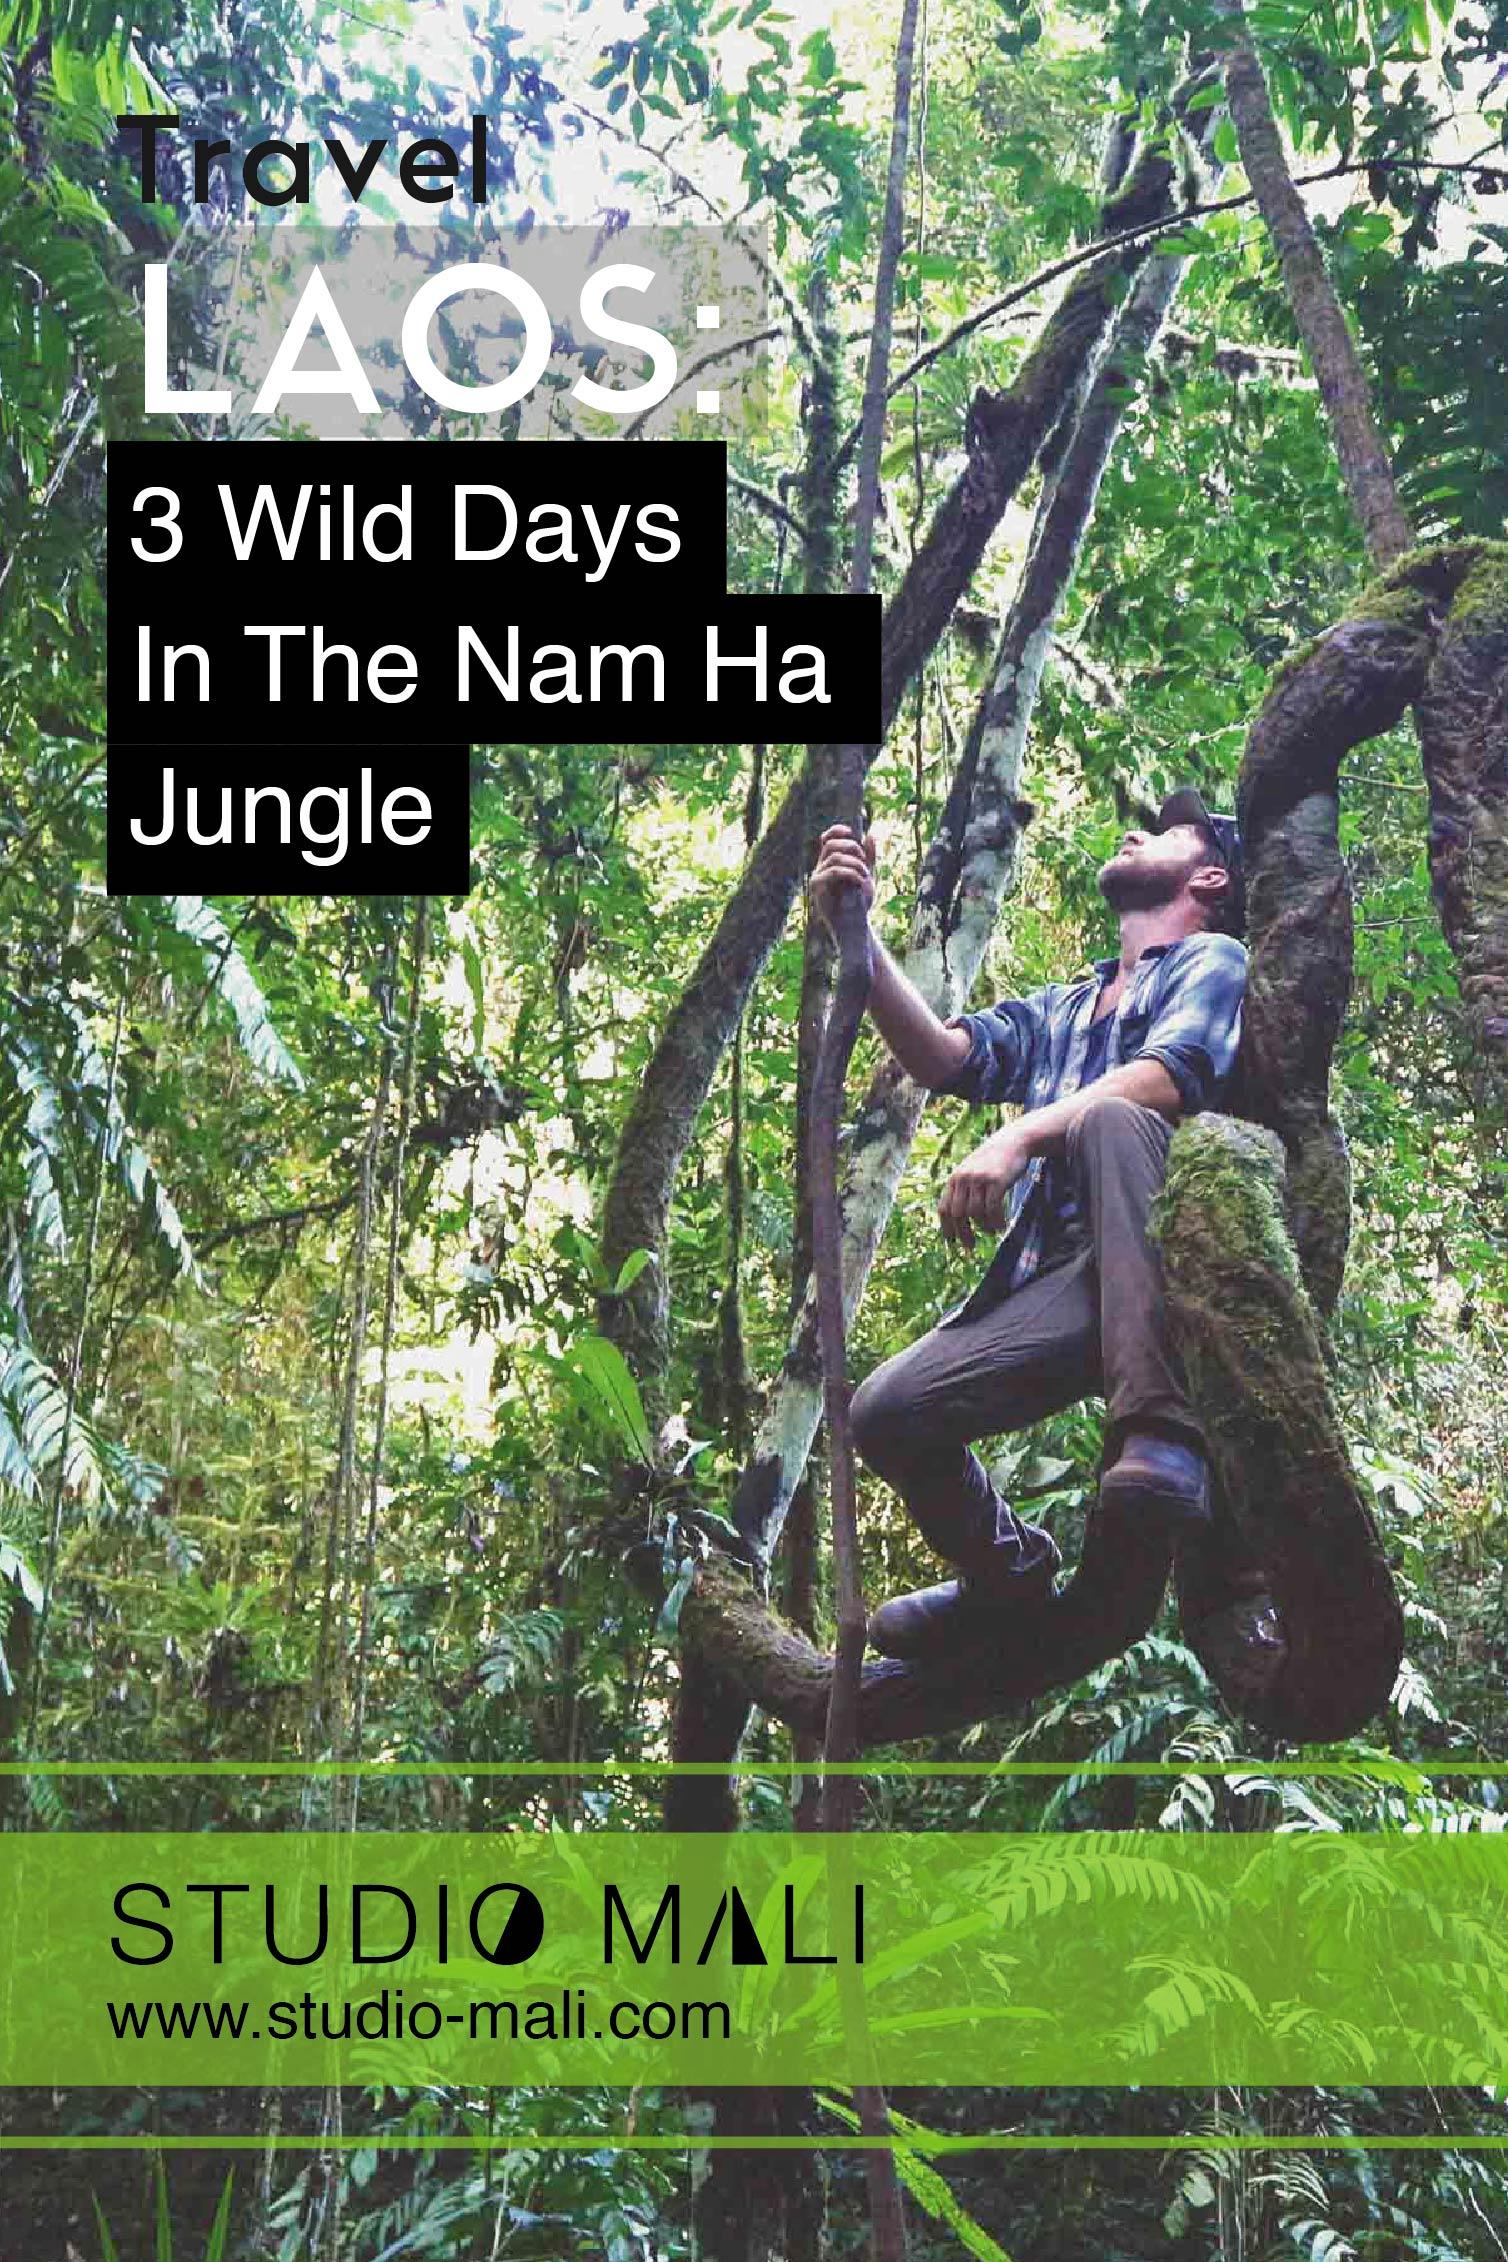 Laos - 3 Wild Days In The Nam Ha Jungle, by Studio Mali.jpg